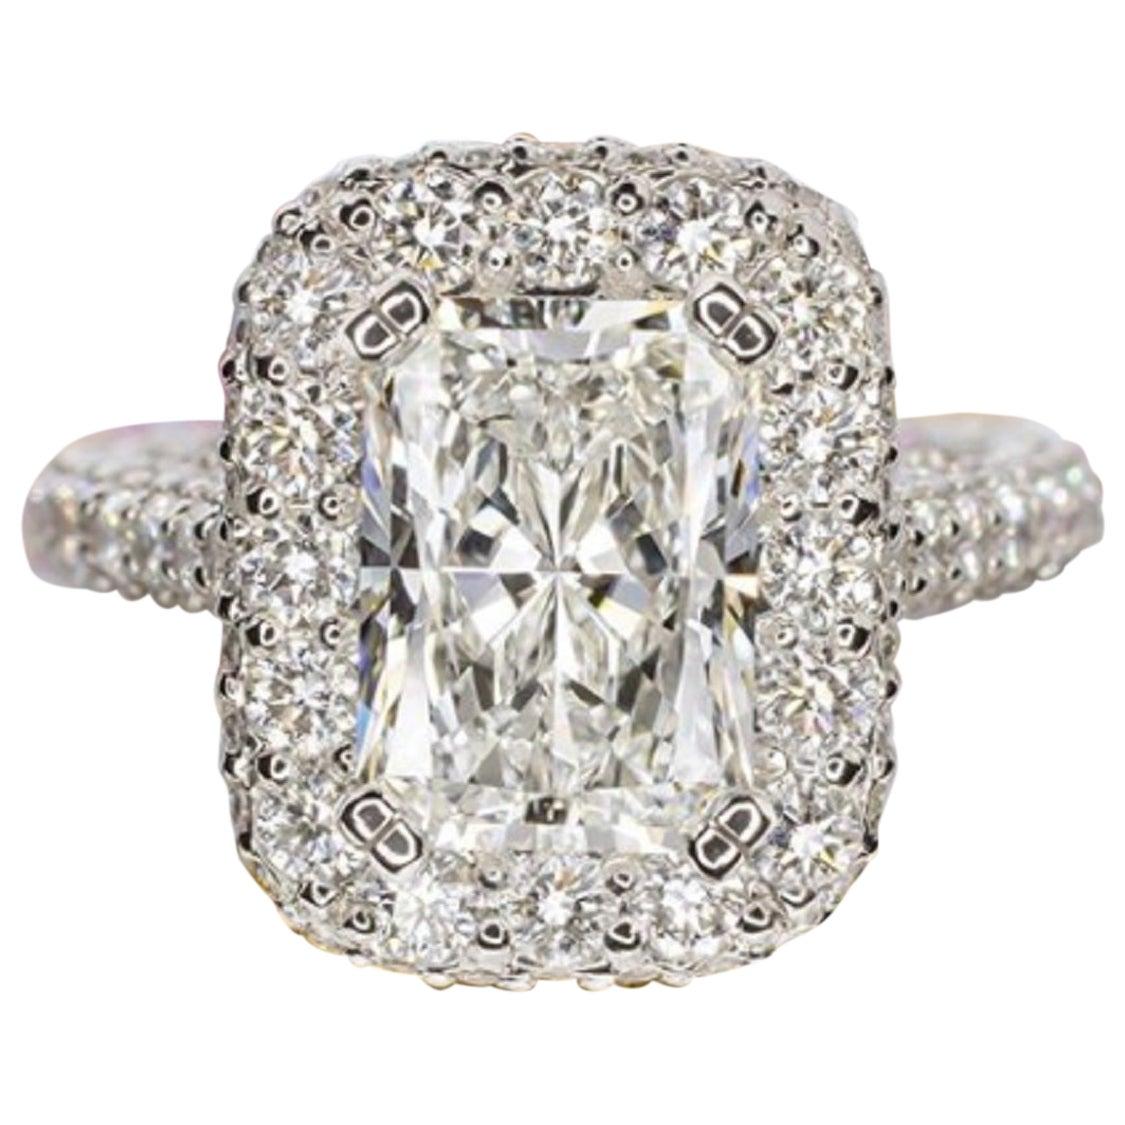 GIA Certified 6.50 Carat Radiant Cut Diamond Halo Ring